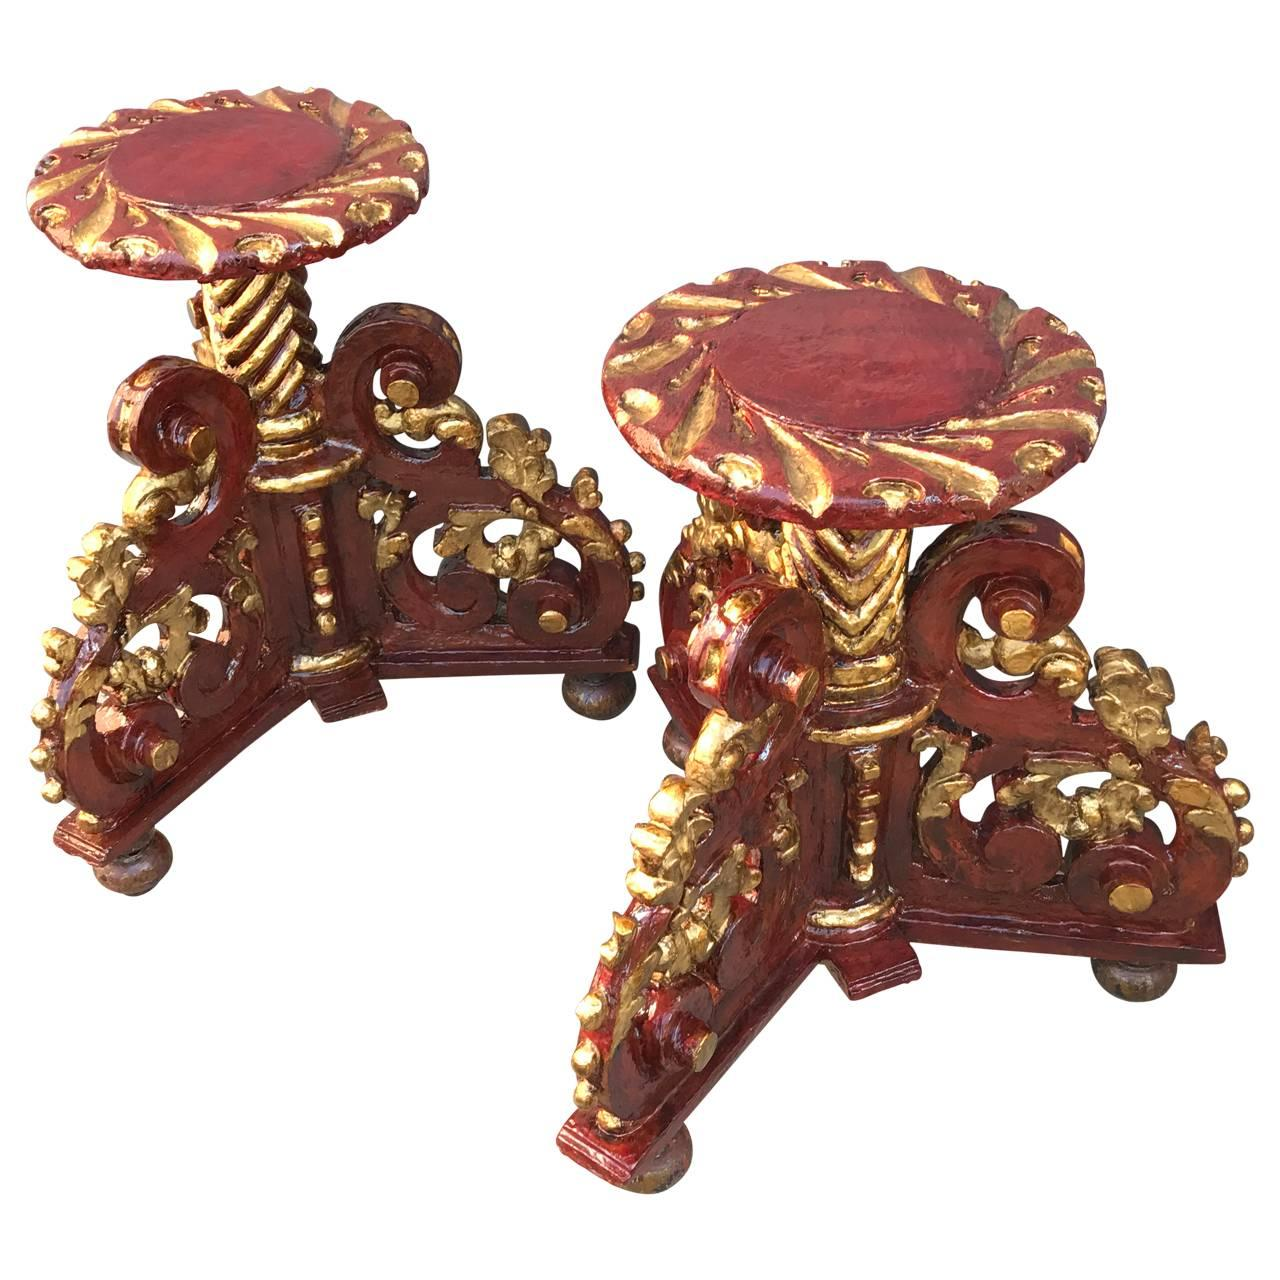 Pair Of 18th Century Spanish Pedestal Tables